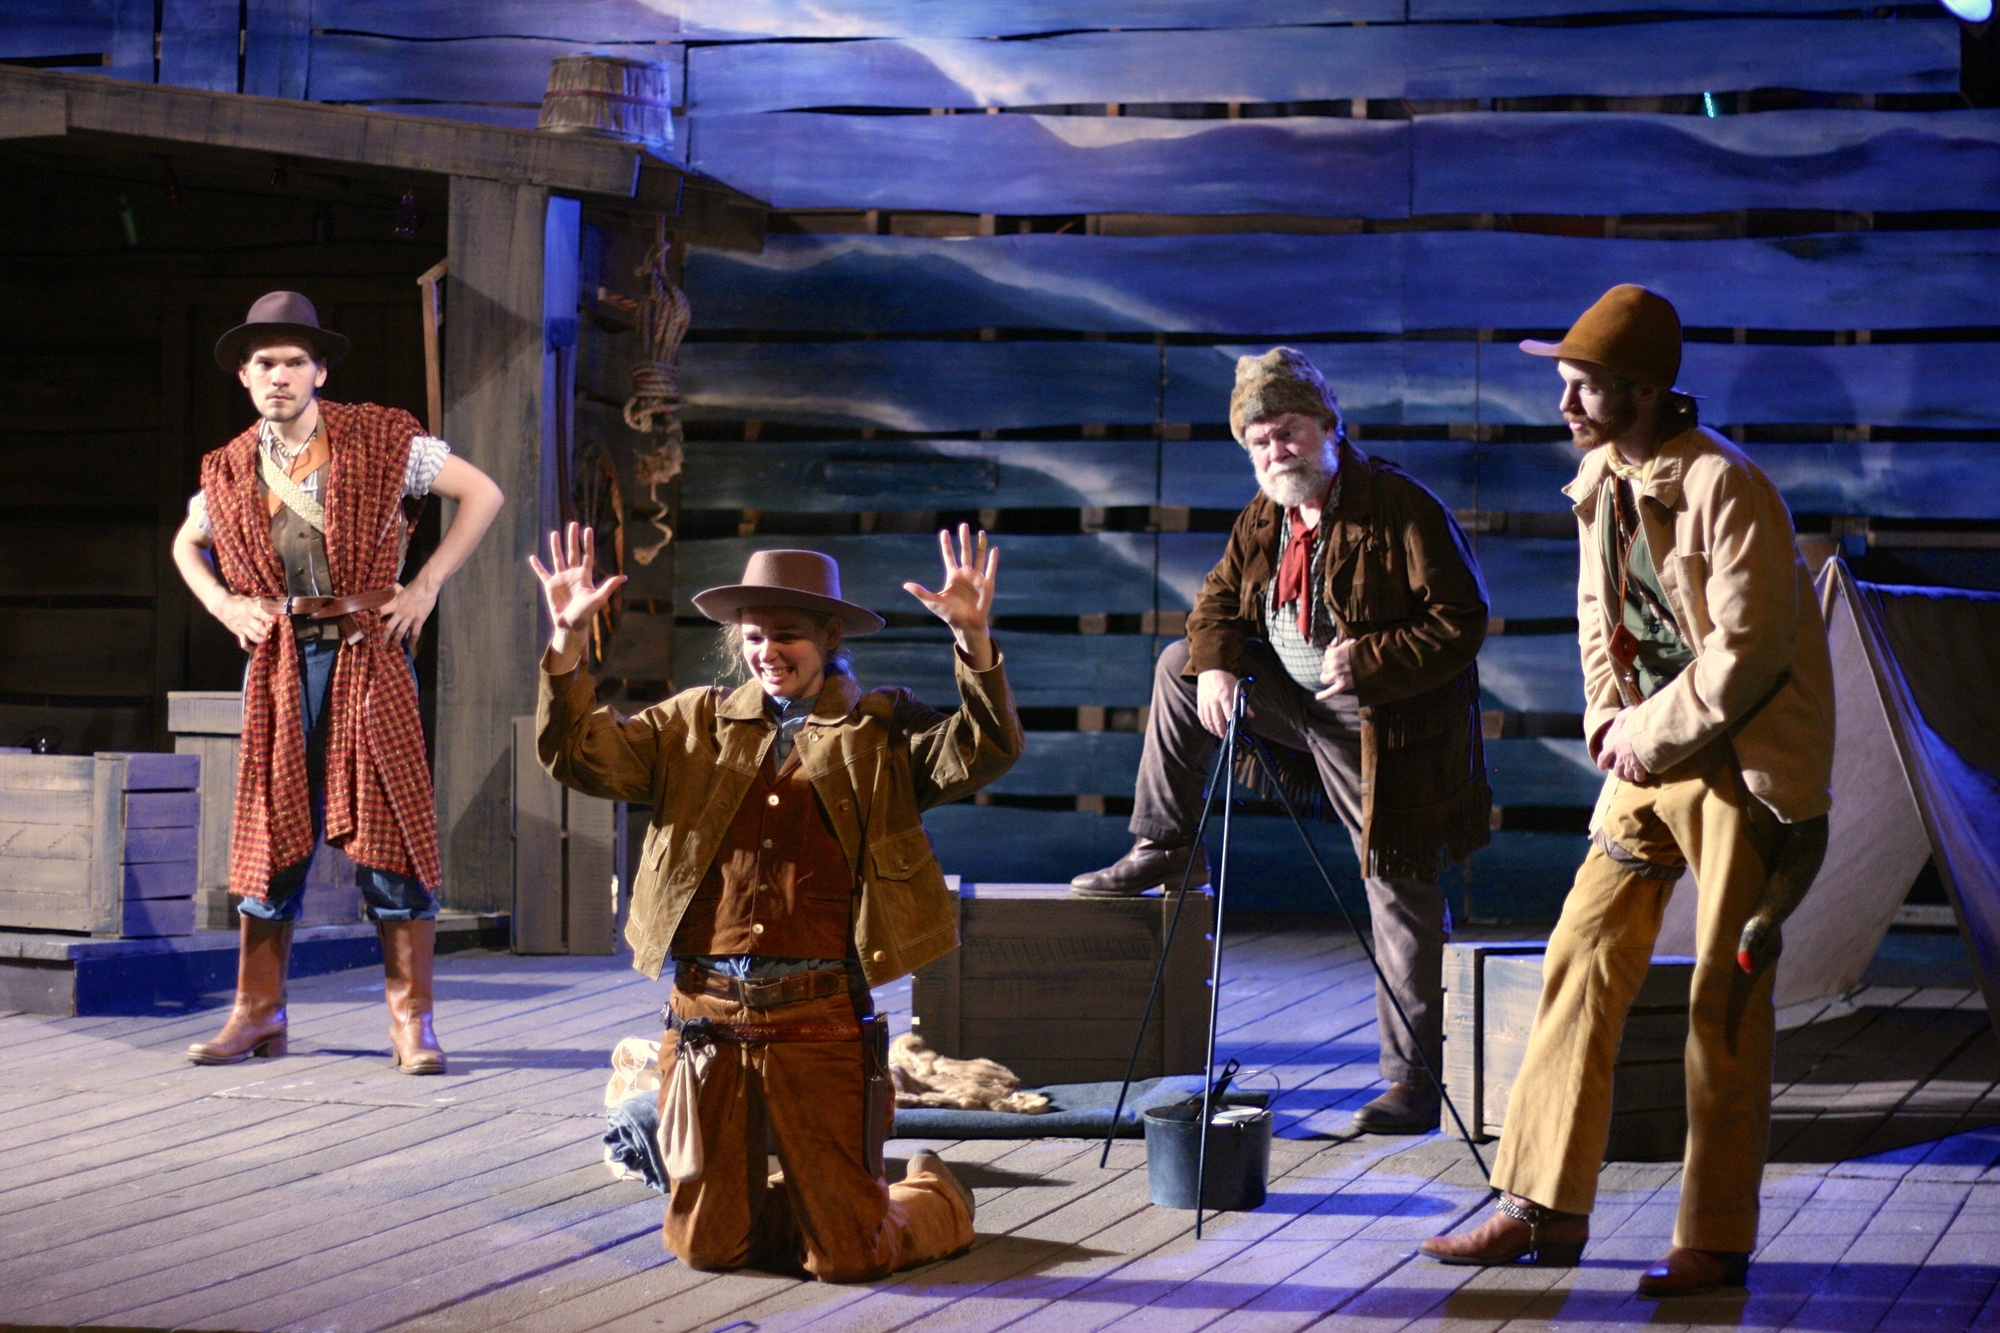 Cymbeline-A-Folk-Musical-Ryan-Czerwonko-Kate-McDermott-Ronald-Keaton-and-Tyler-Rich (1)